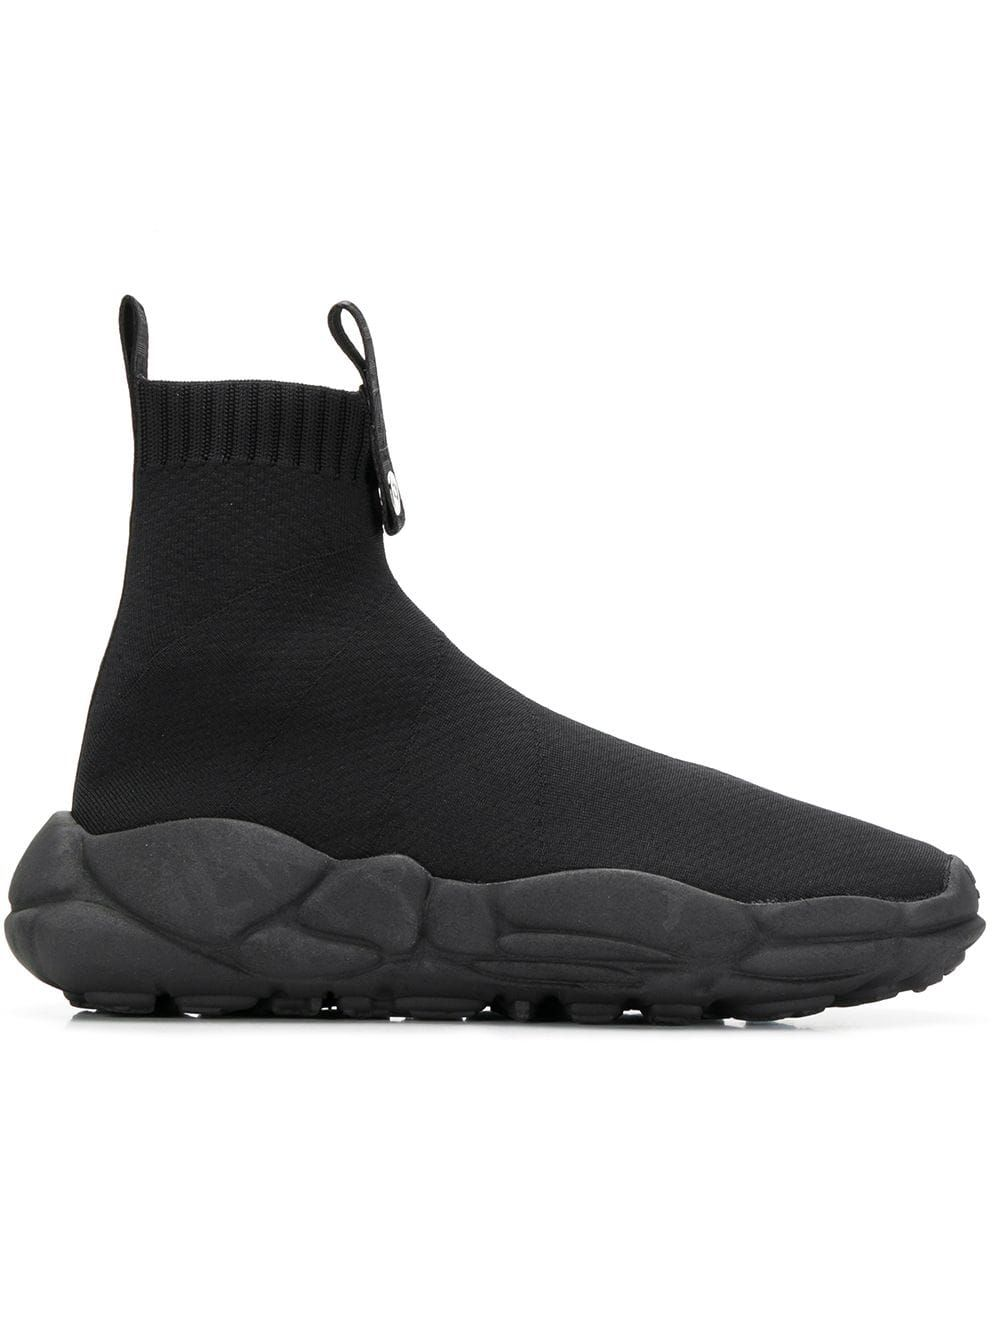 Versus hi-top Sock Sneakers - Farfetch